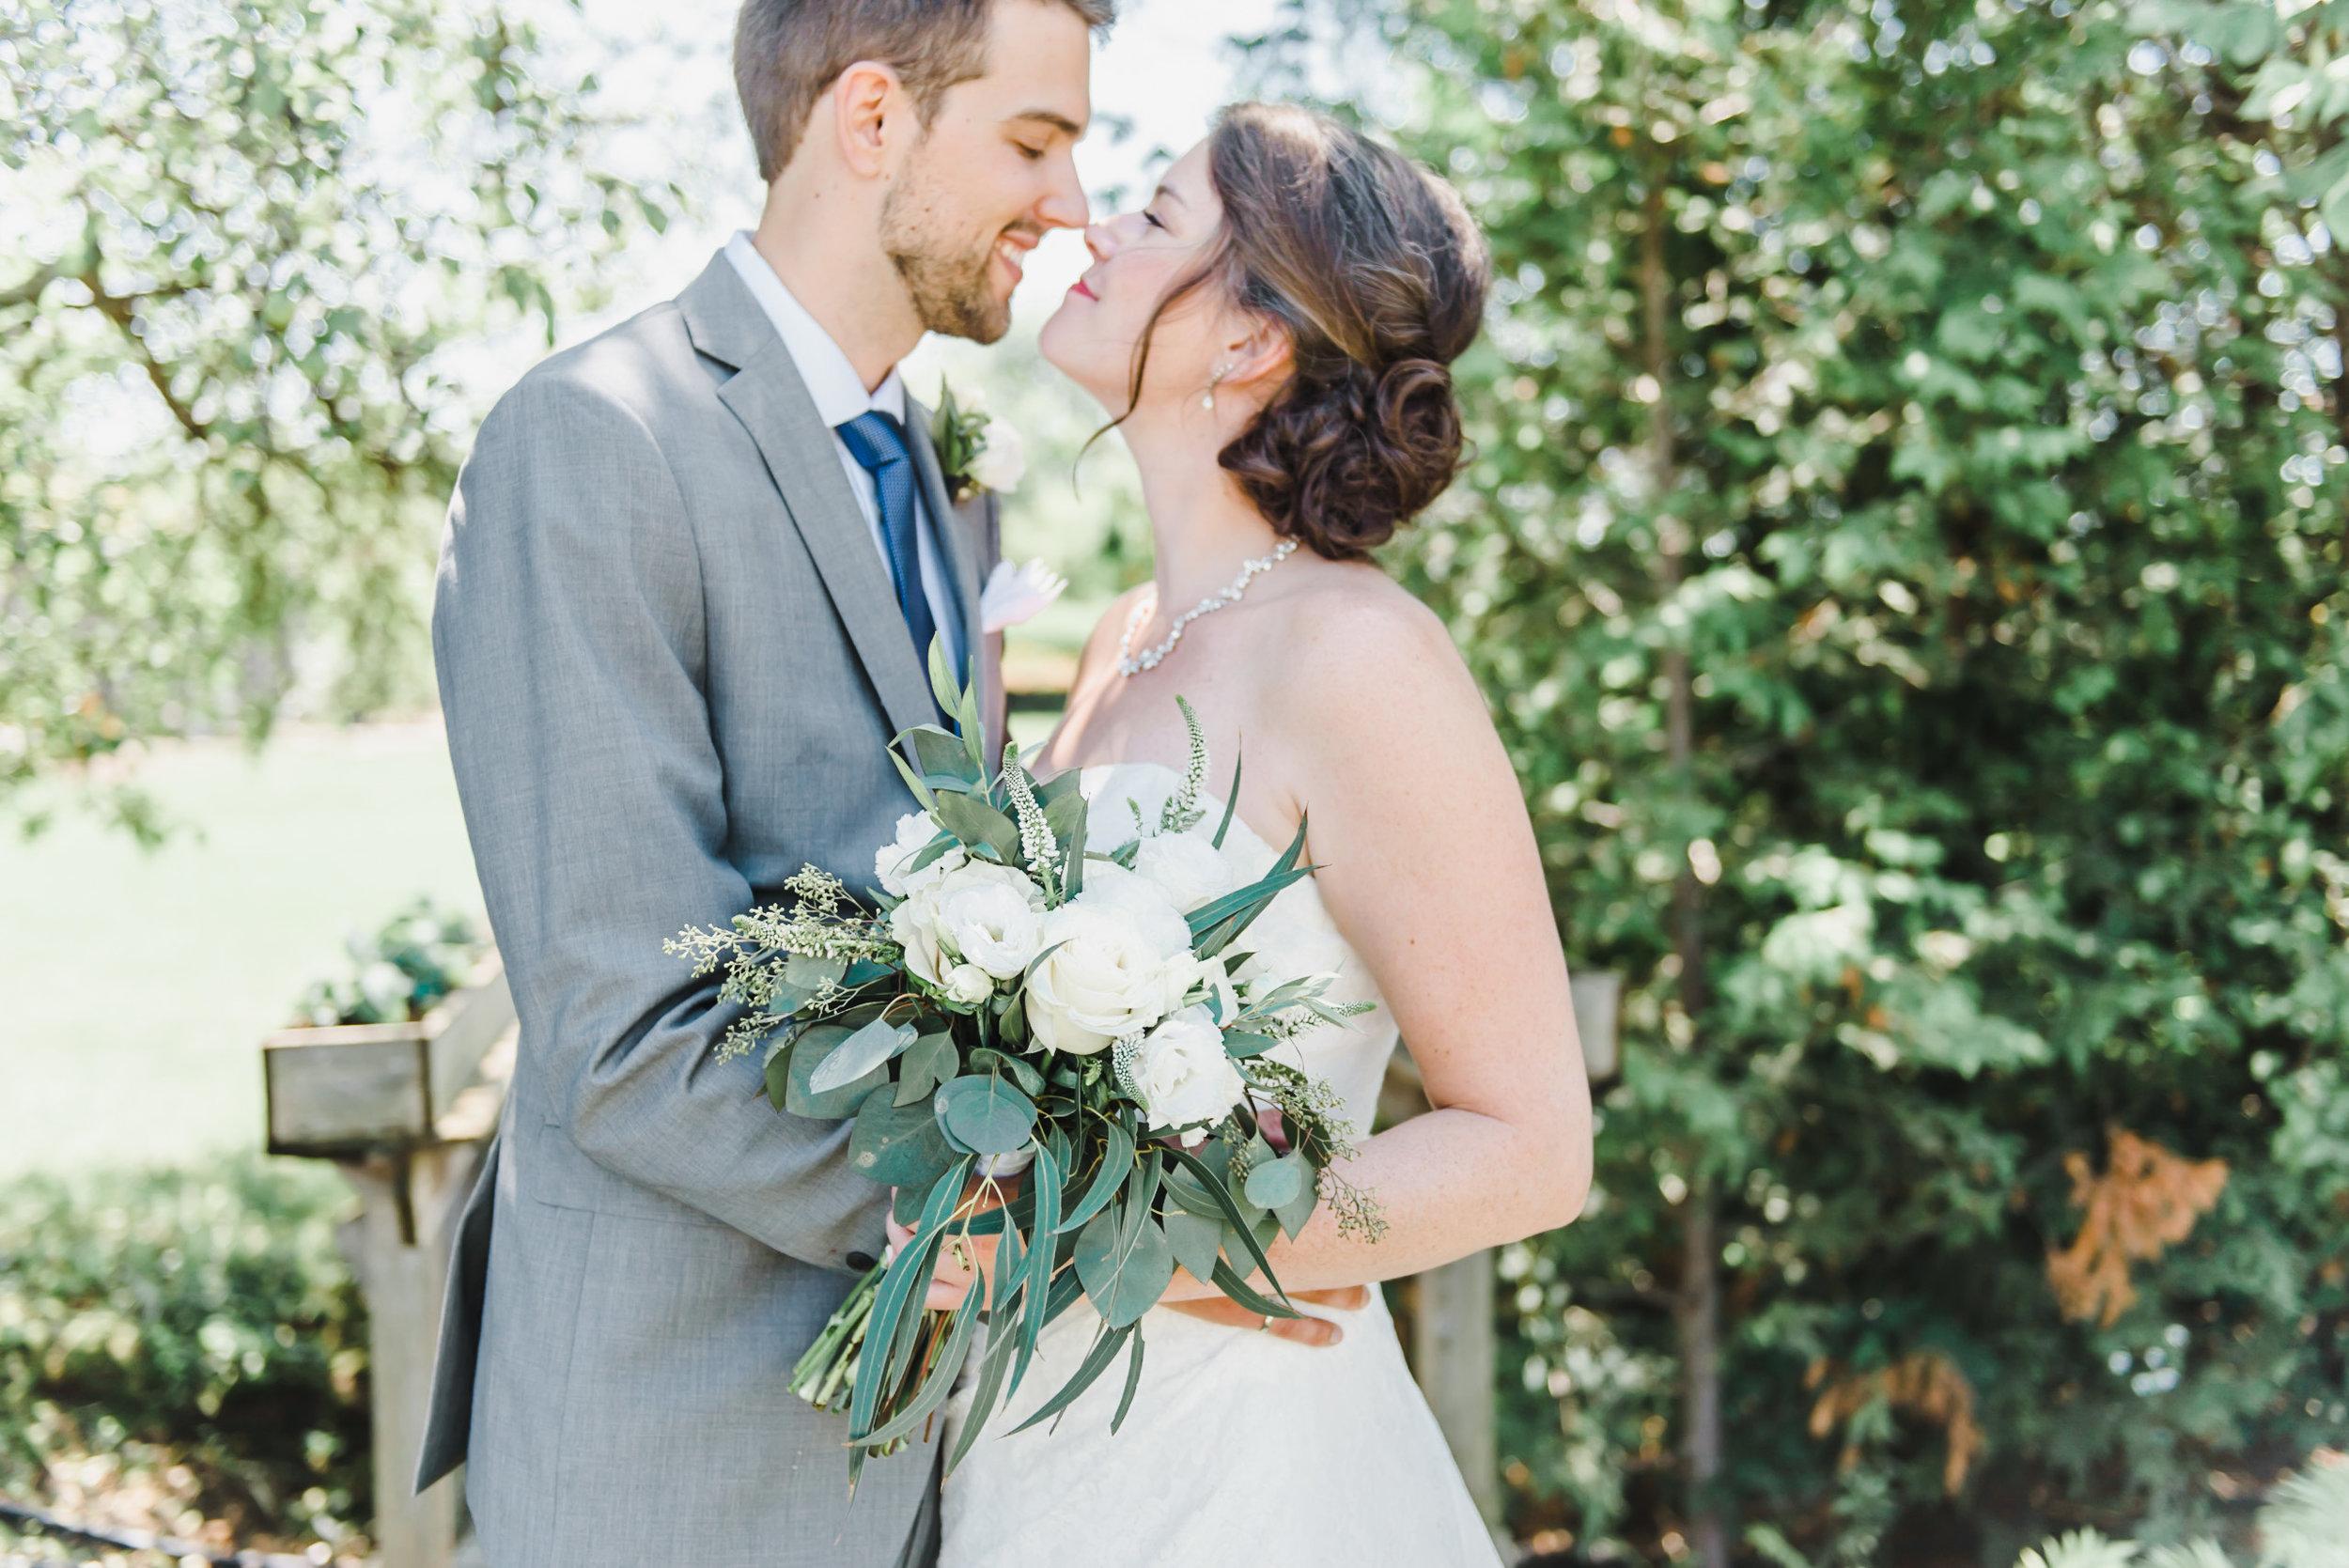 Ottawa Organic Garden-Inspired Wedding Bouquet  | Ottawa Light and Airy Wedding Photographer-4.jpg